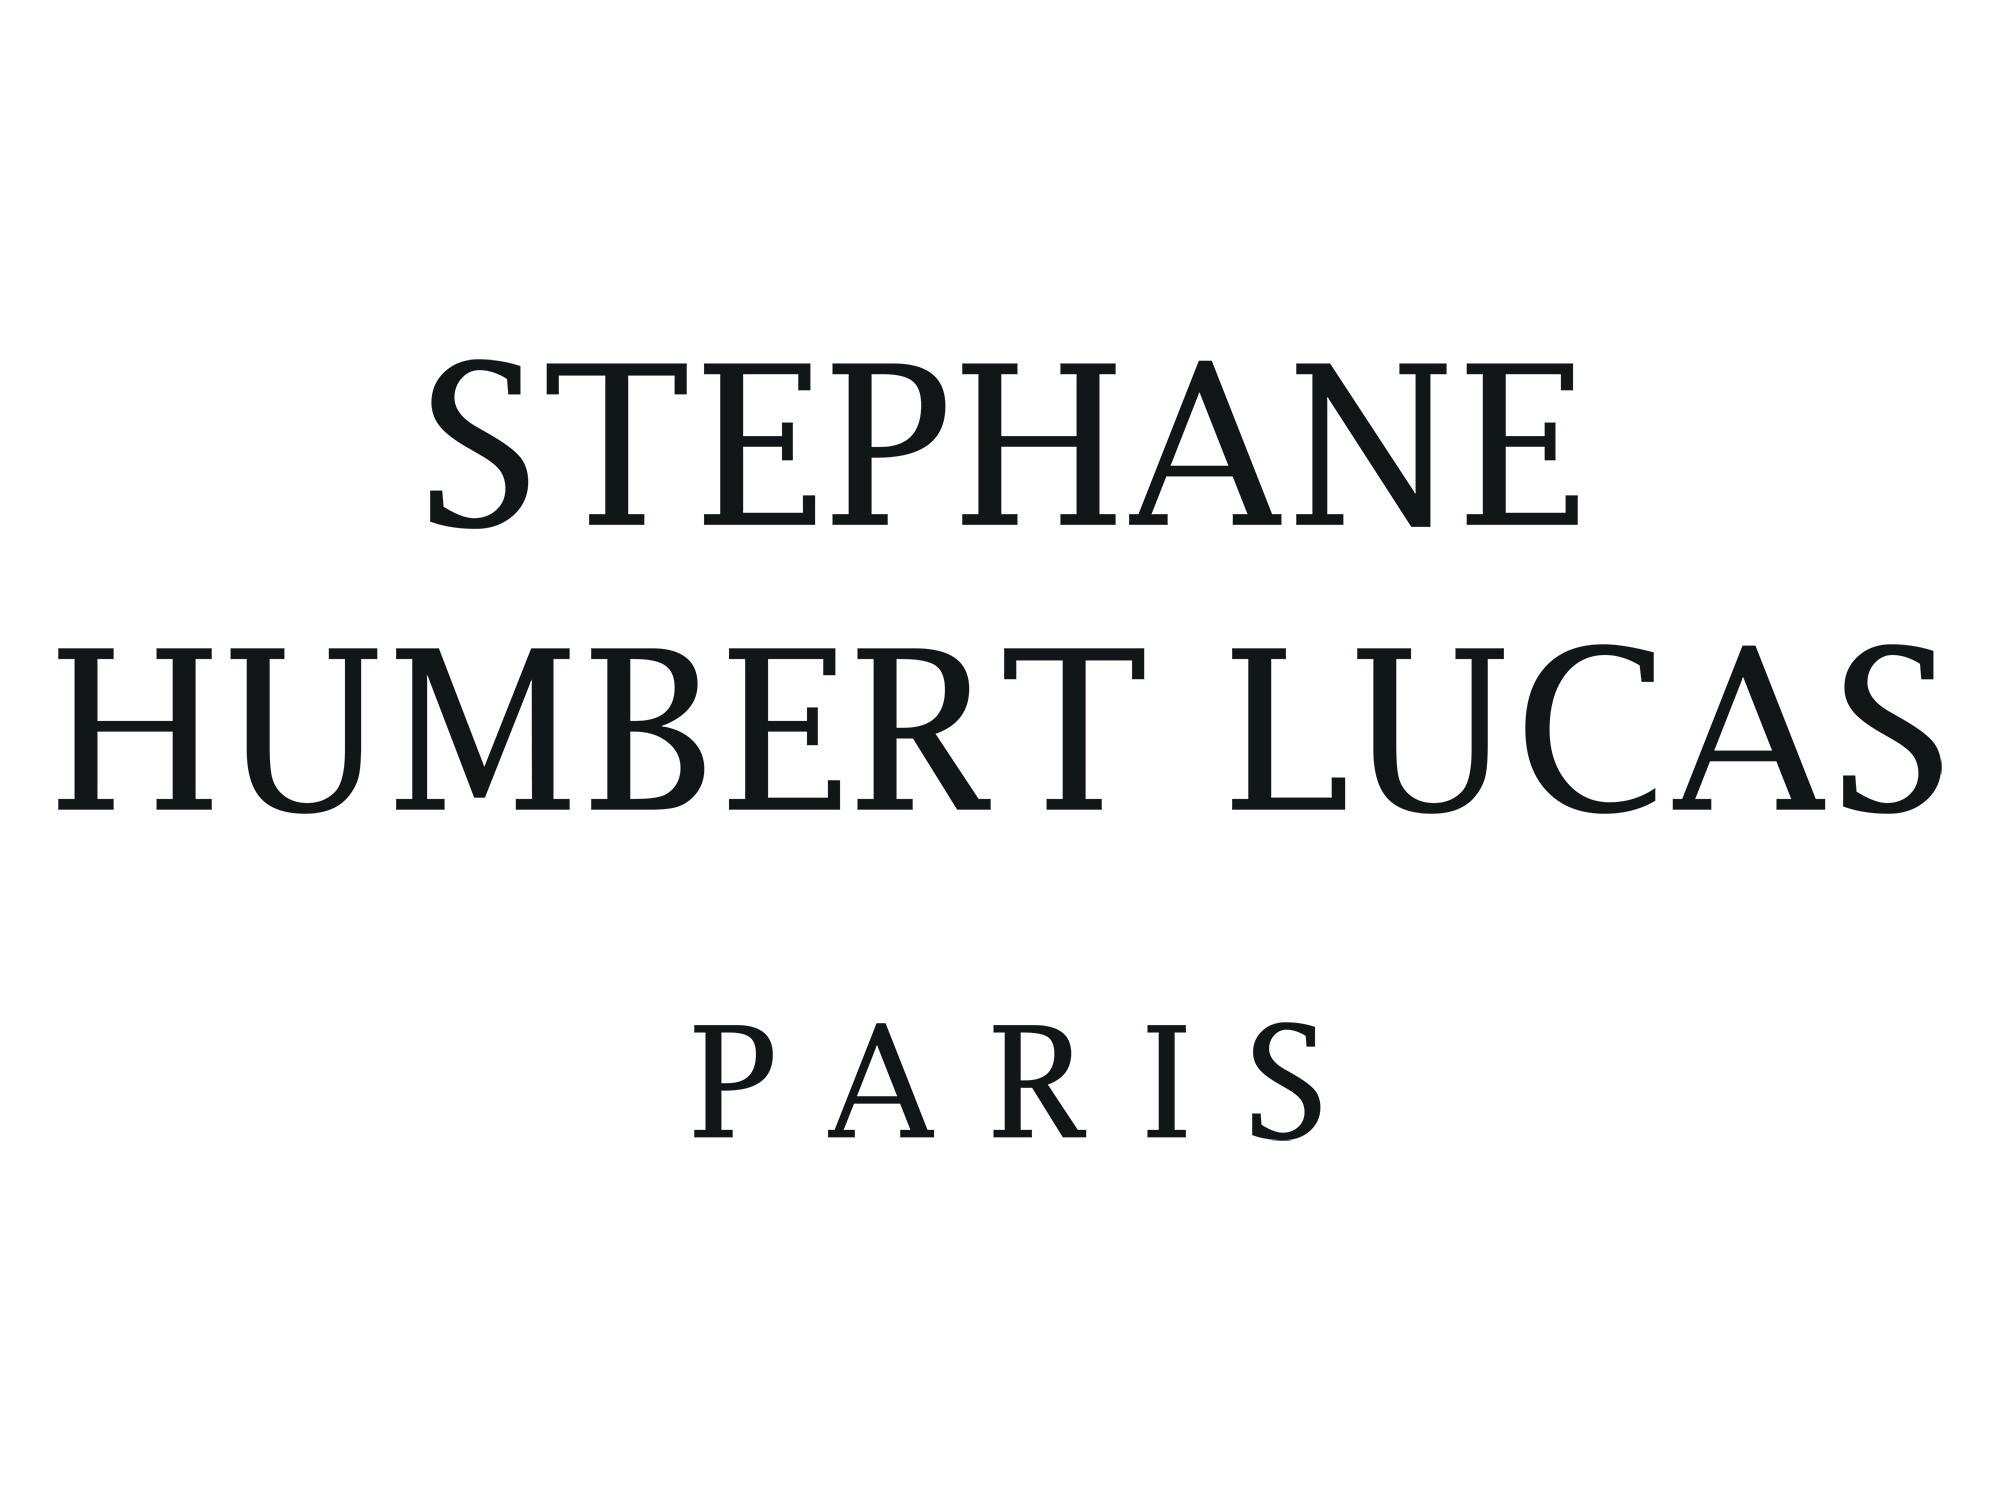 Stephane Humbert Lucas